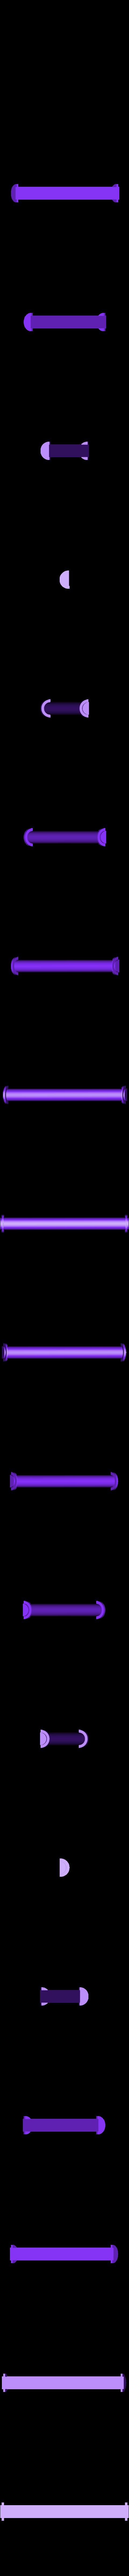 Steam_Pipe-b.STL Download free STL file 4-8-8-4 Big Boy Locomotive • 3D printer object, RaymondDeLuca